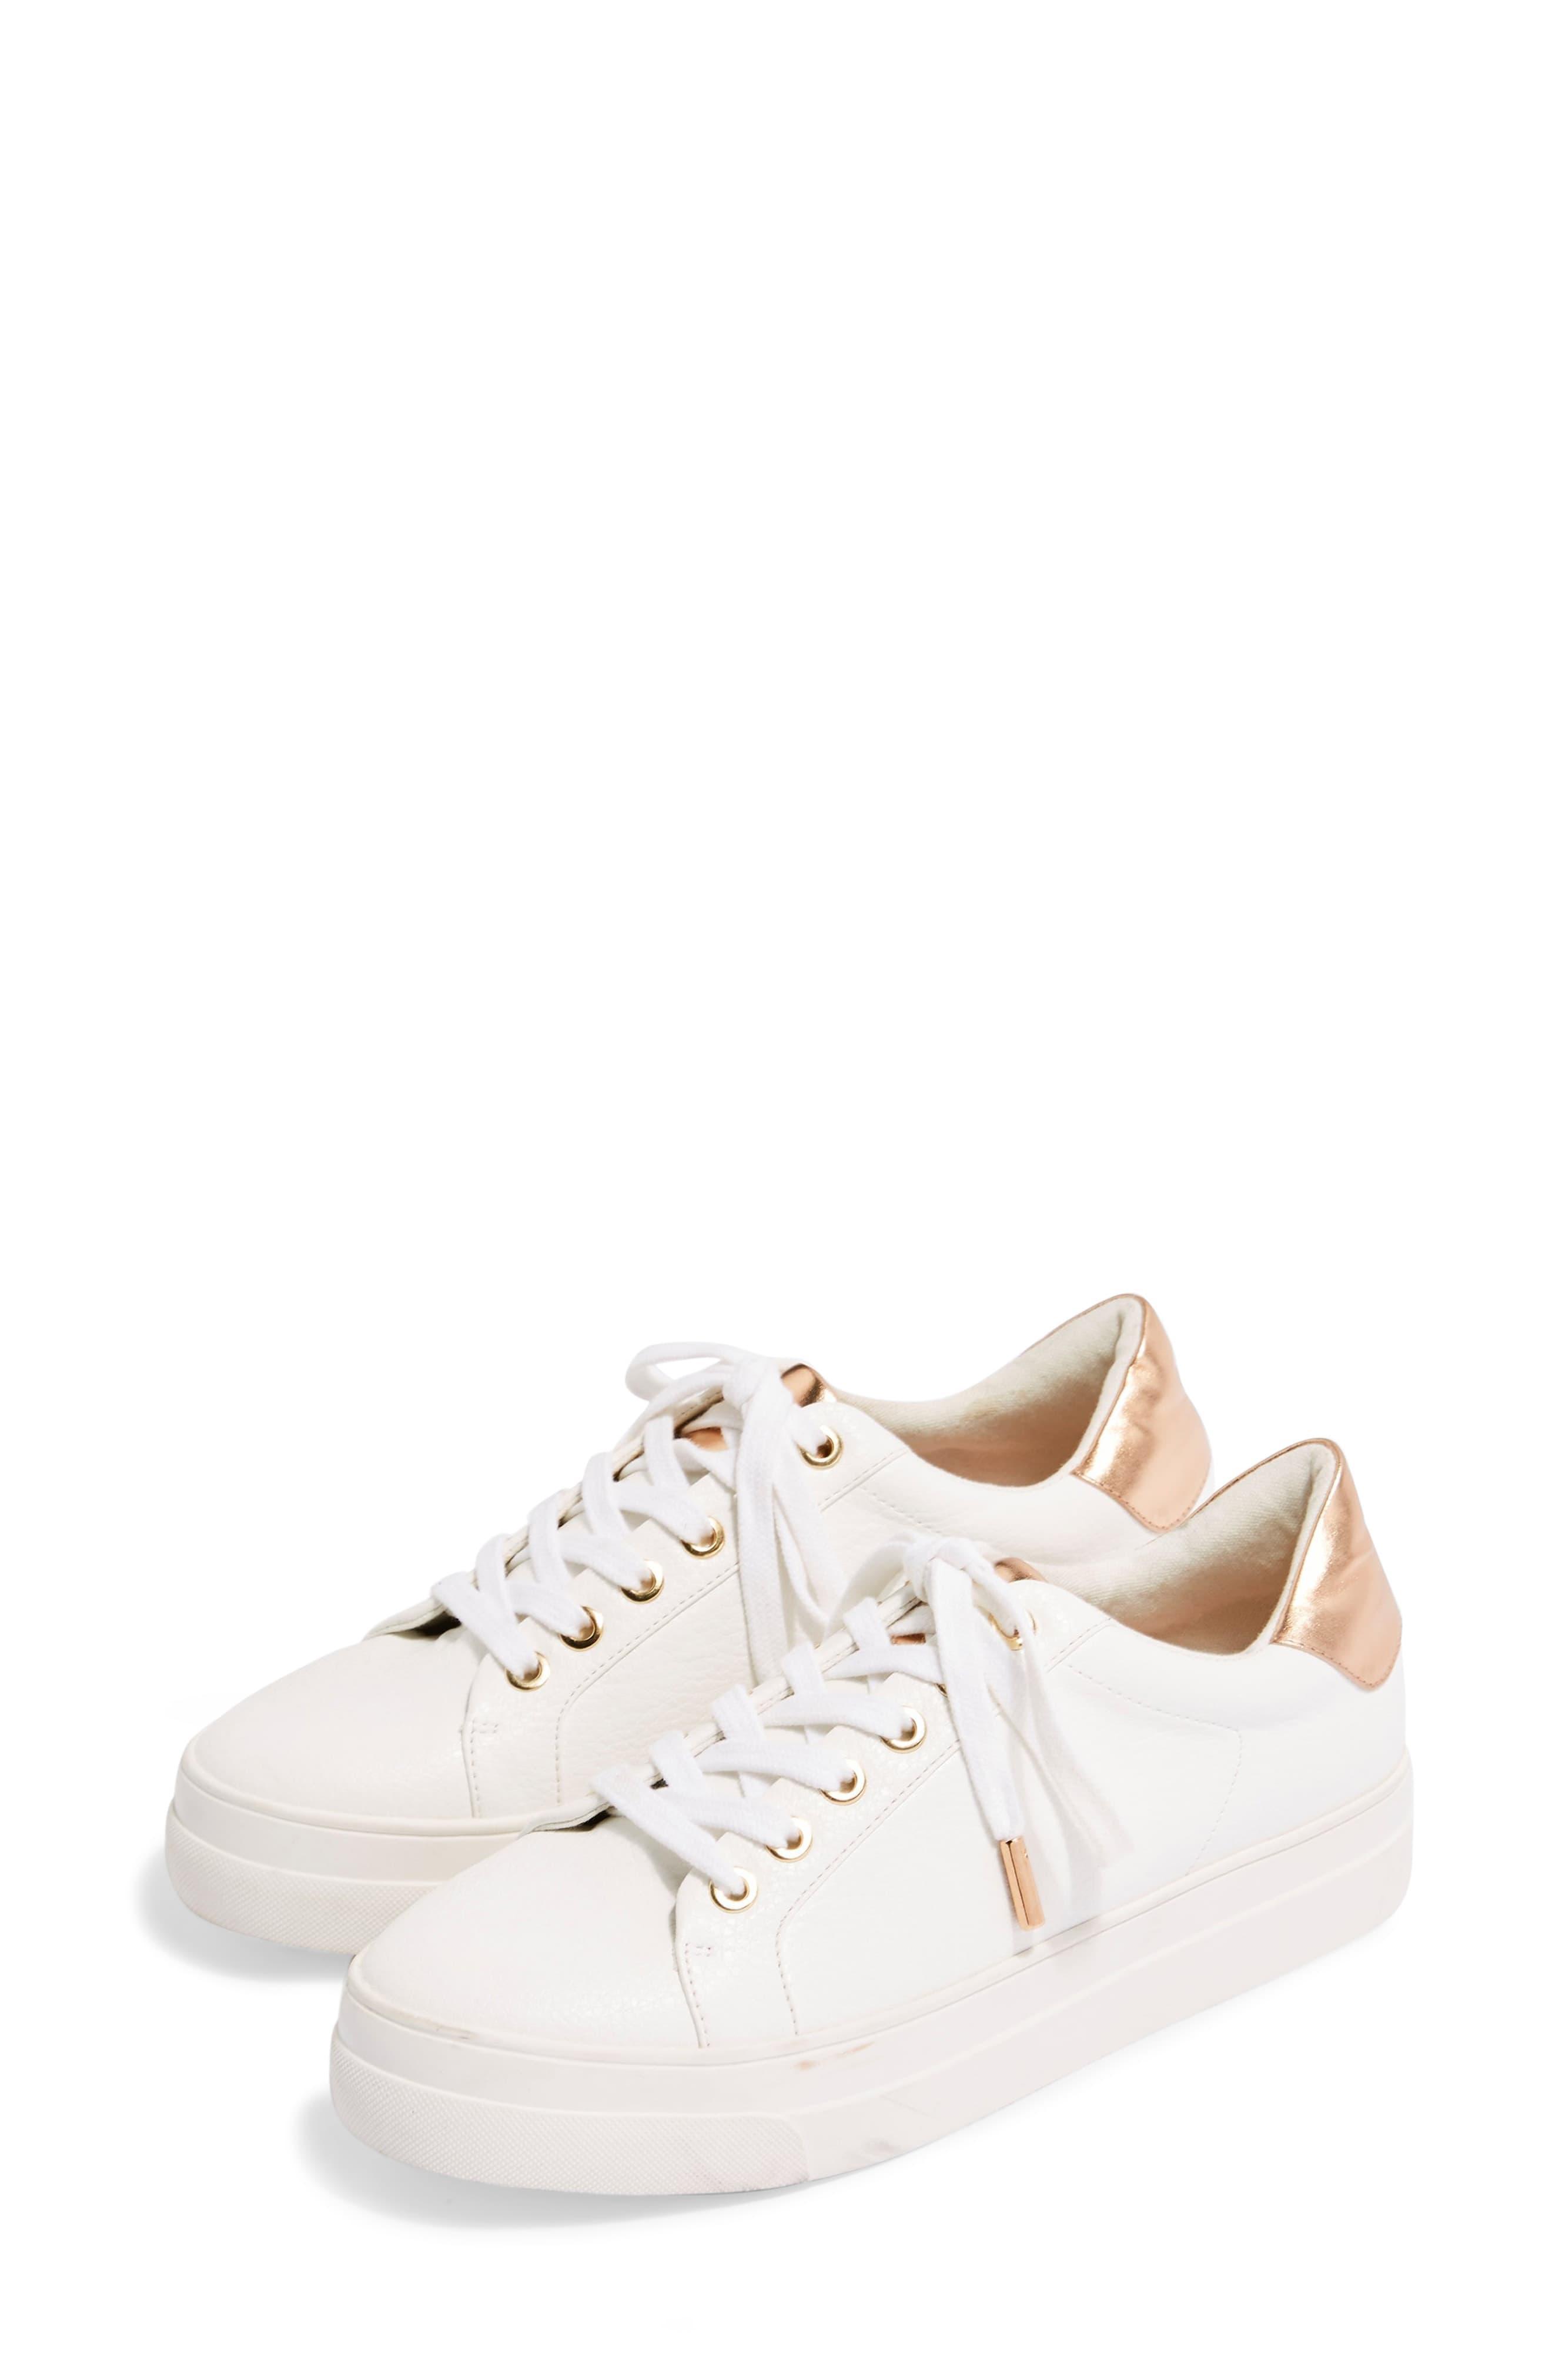 TOPSHOP Candy Platform Sneaker - Lyst